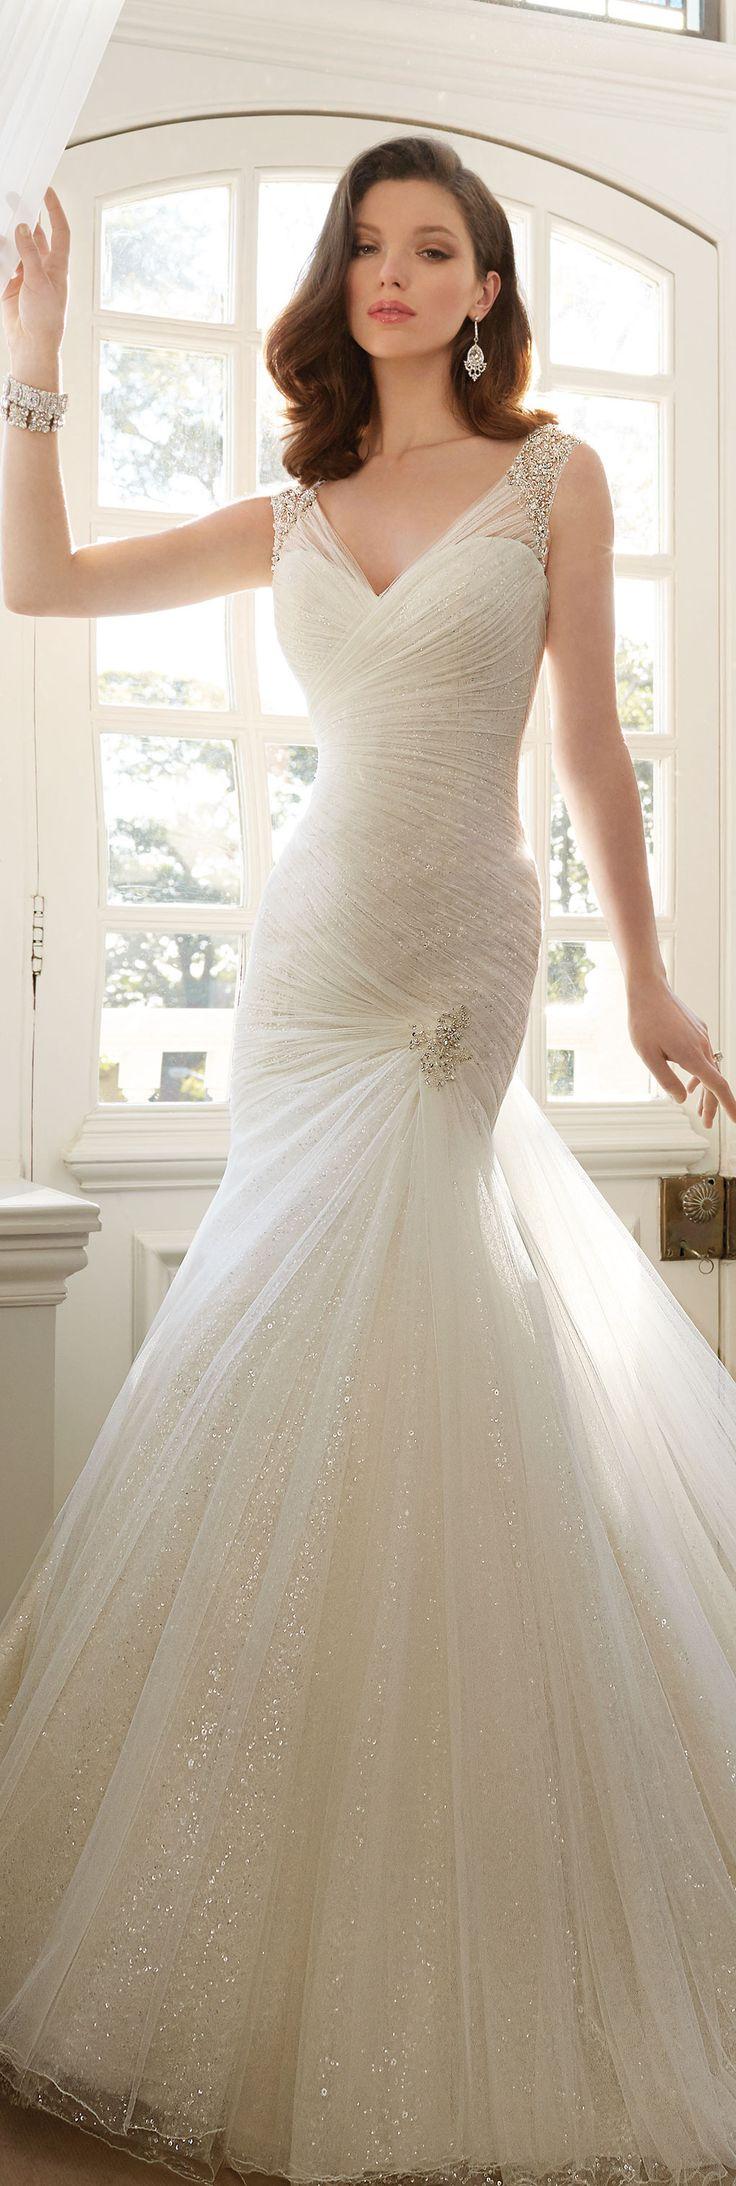 Romona keveza lace wedding dress october 2018  best Couture wedding images on Pinterest  Wedding dressses